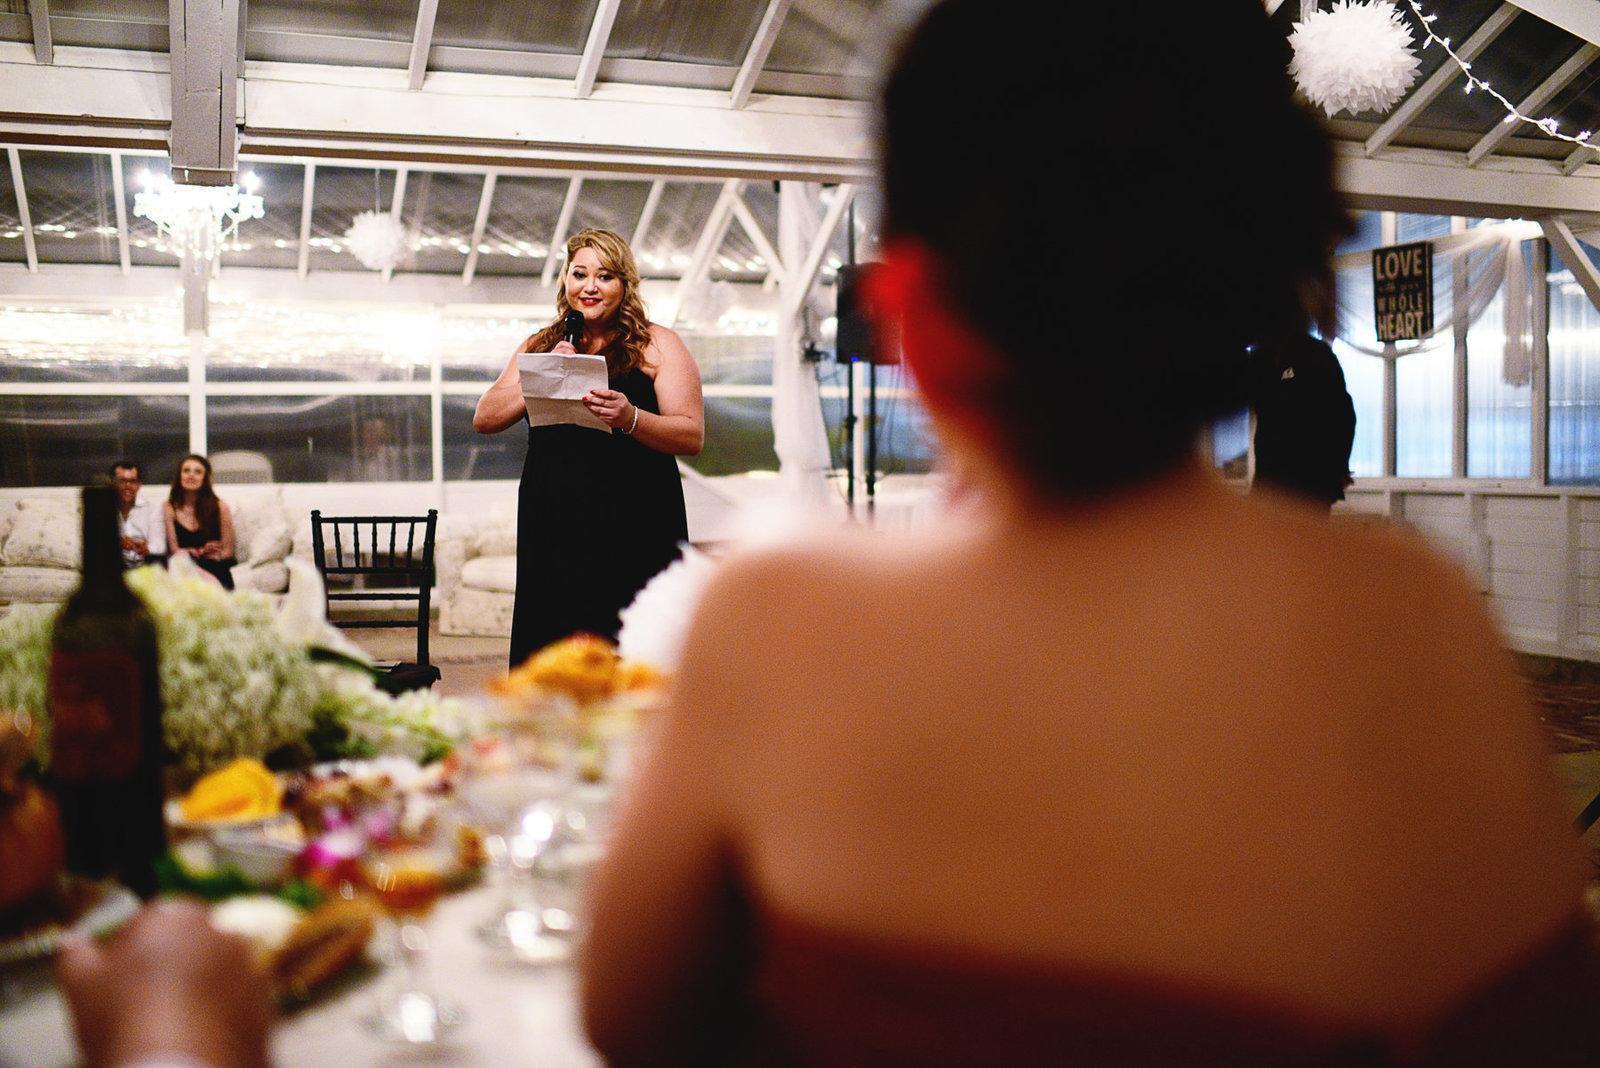 malibu wedding photographer photos celebrity wedding photographer bryan newfield photography ruth mike 52